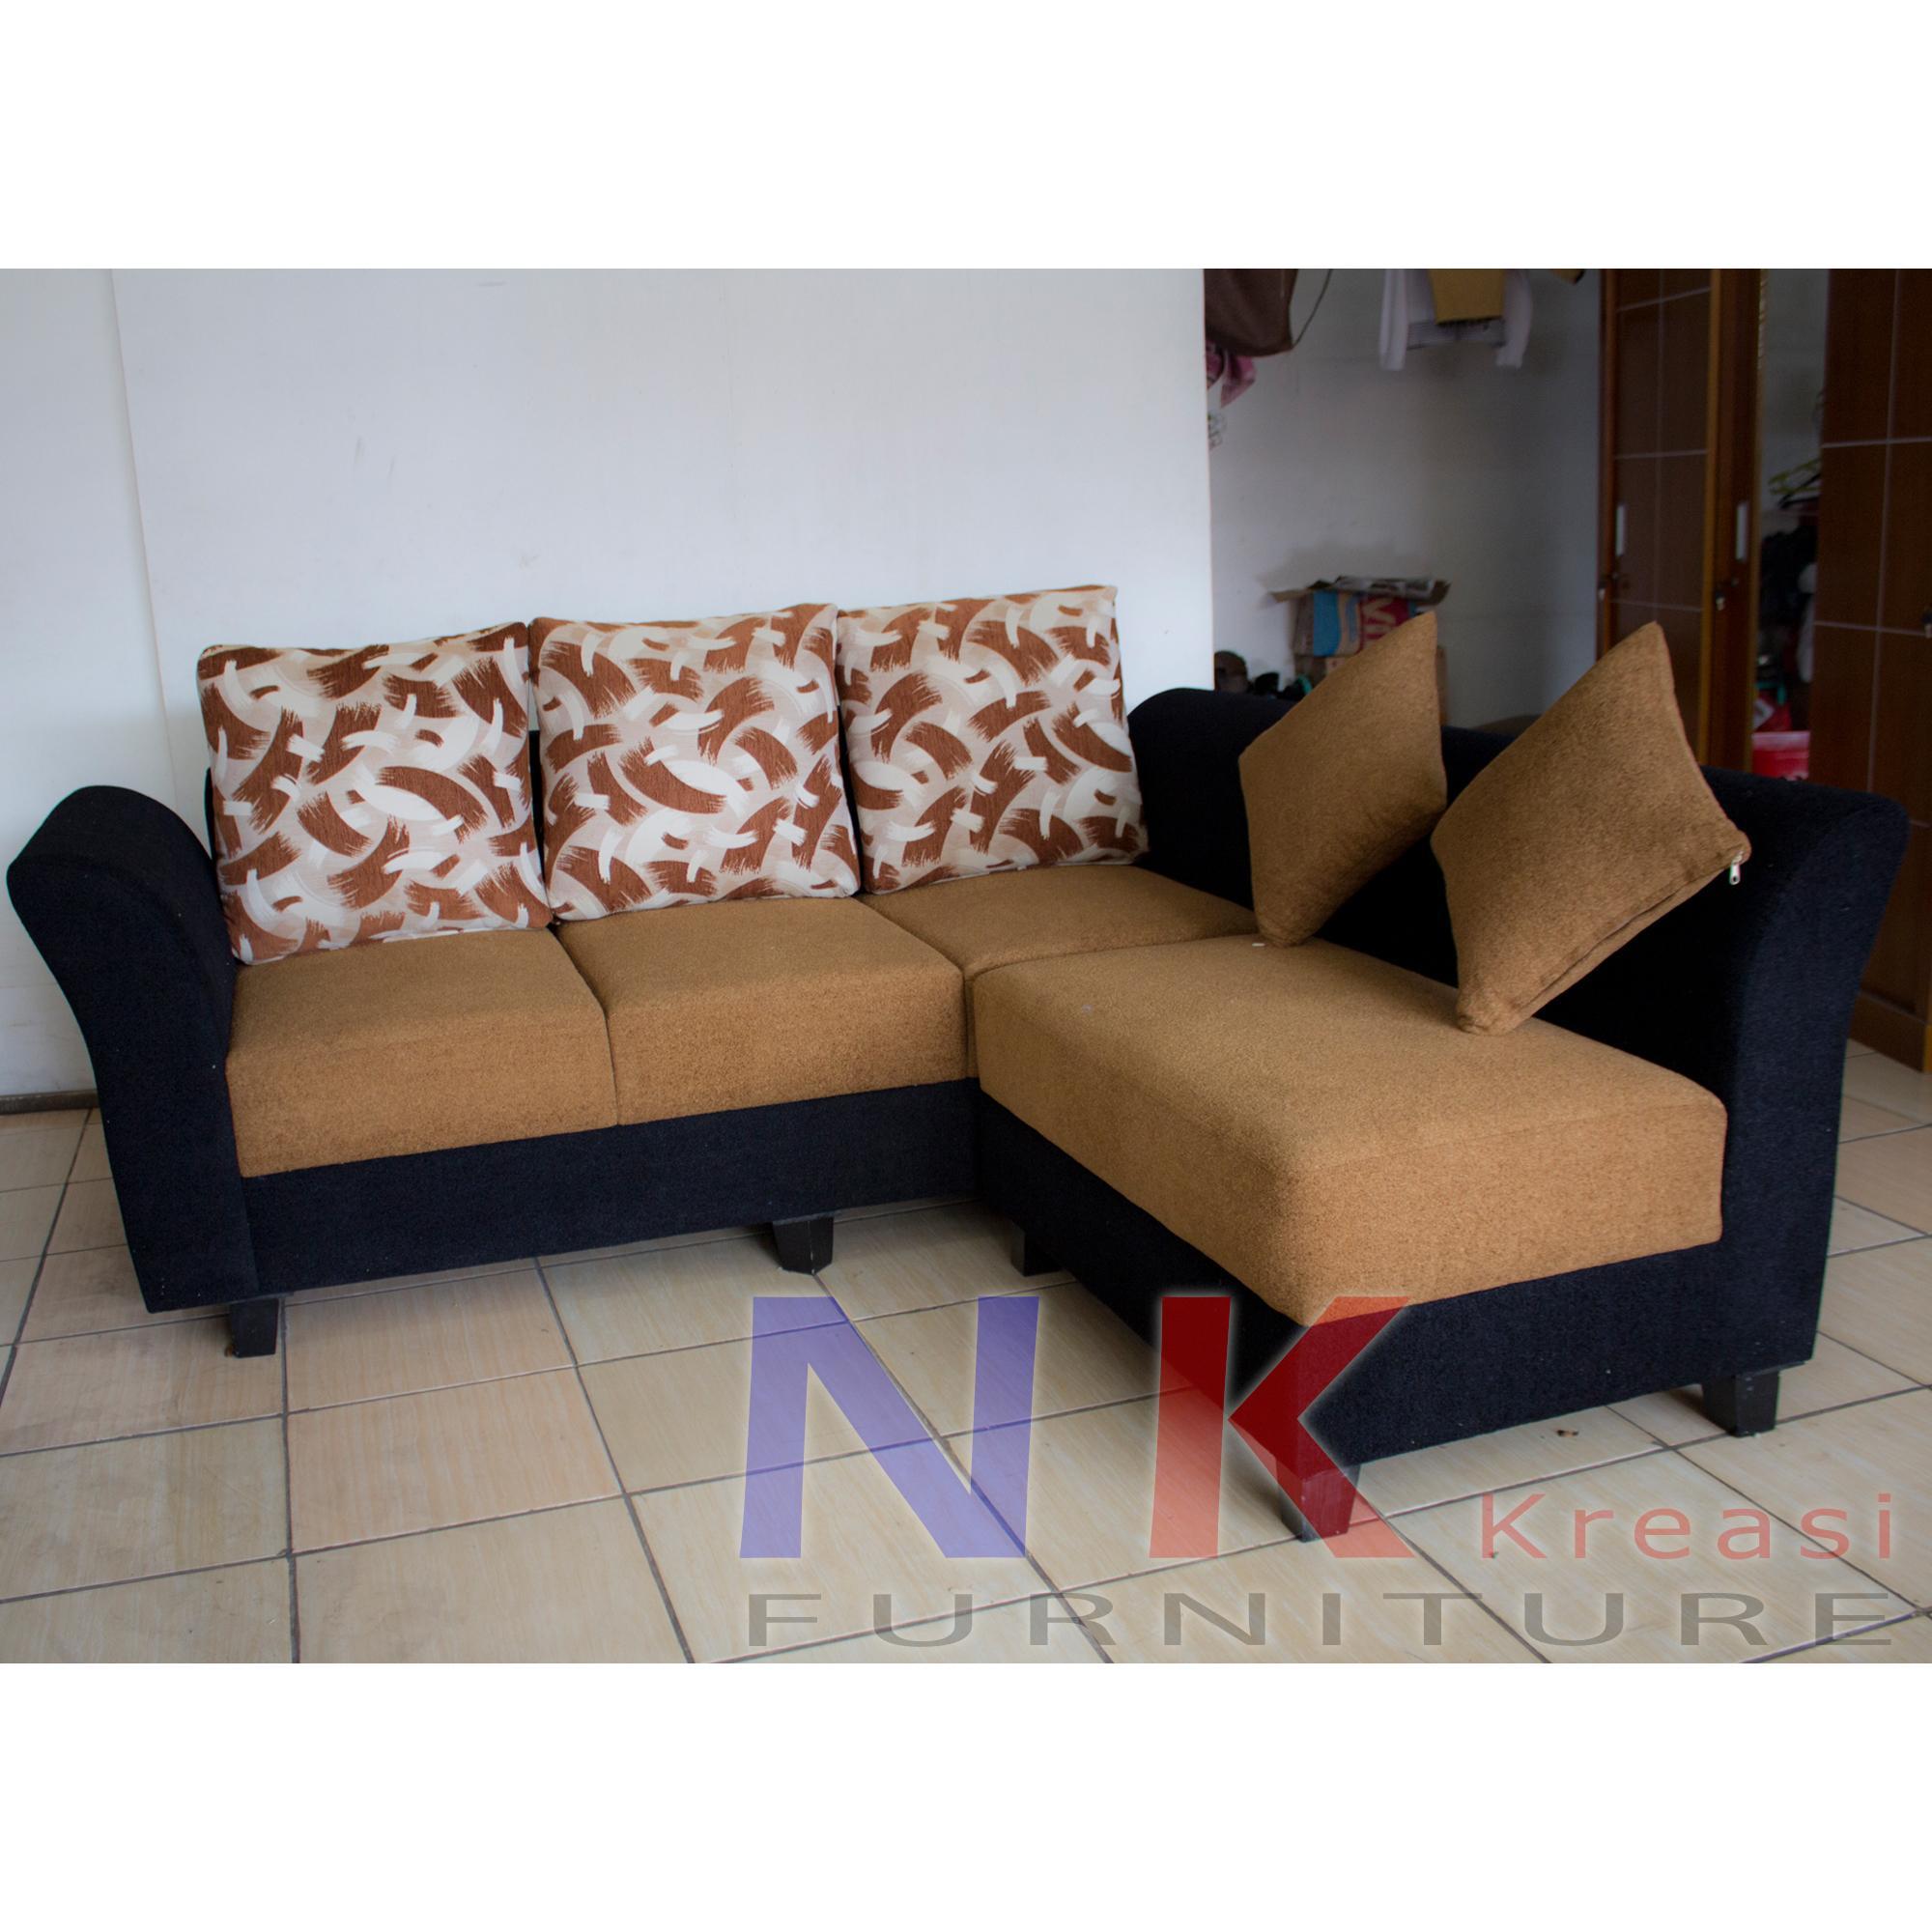 Sofa Kursi Tamu L minimalis, sofa L sudut mewah + MEJA TAMU - JABODETABEK ONLY